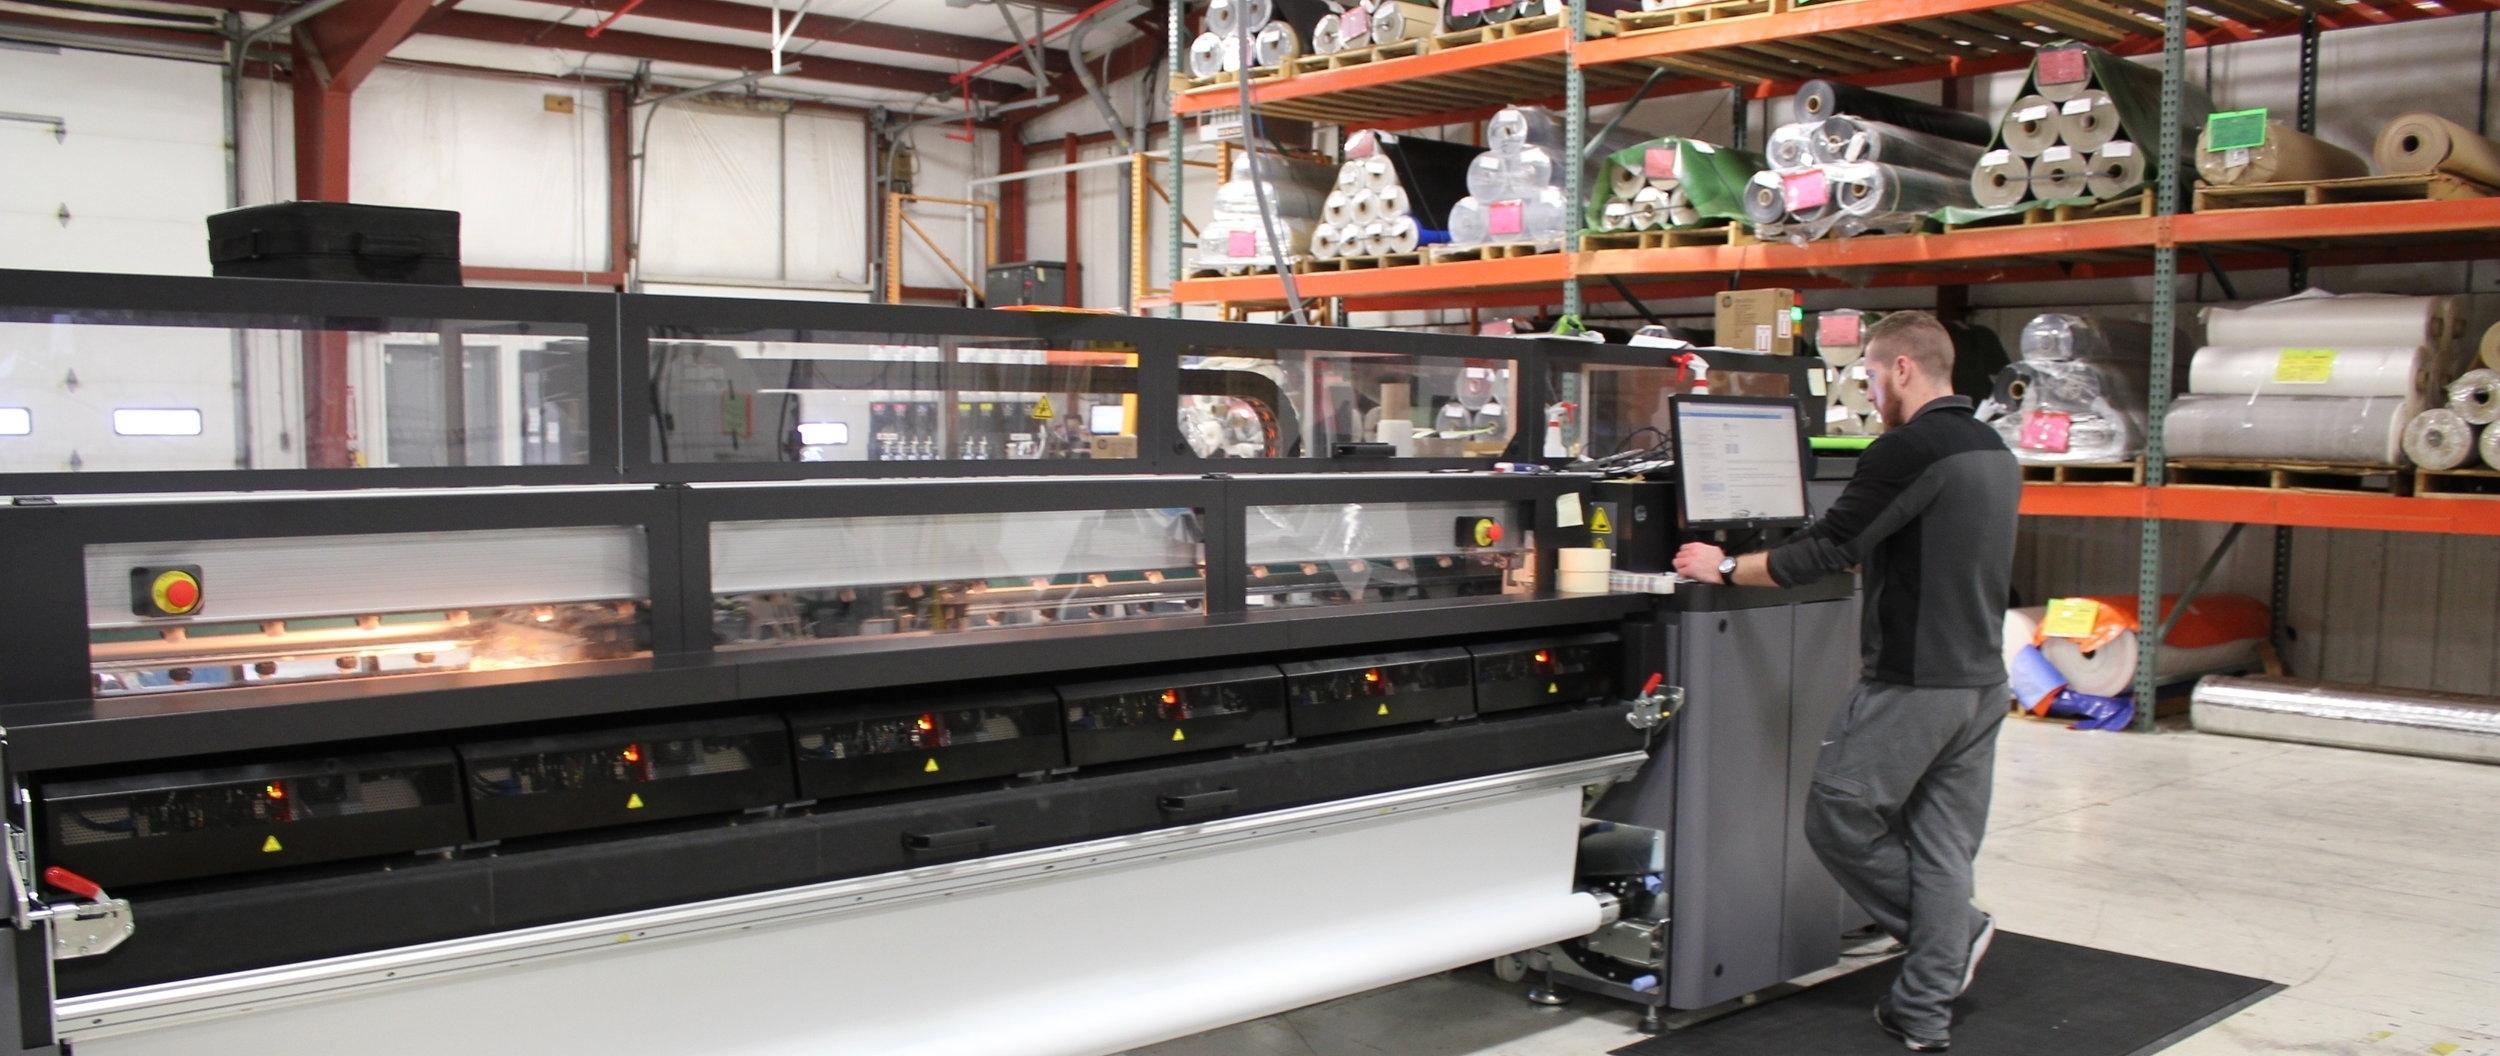 facility_celina_print shop_printing machine_04.JPG